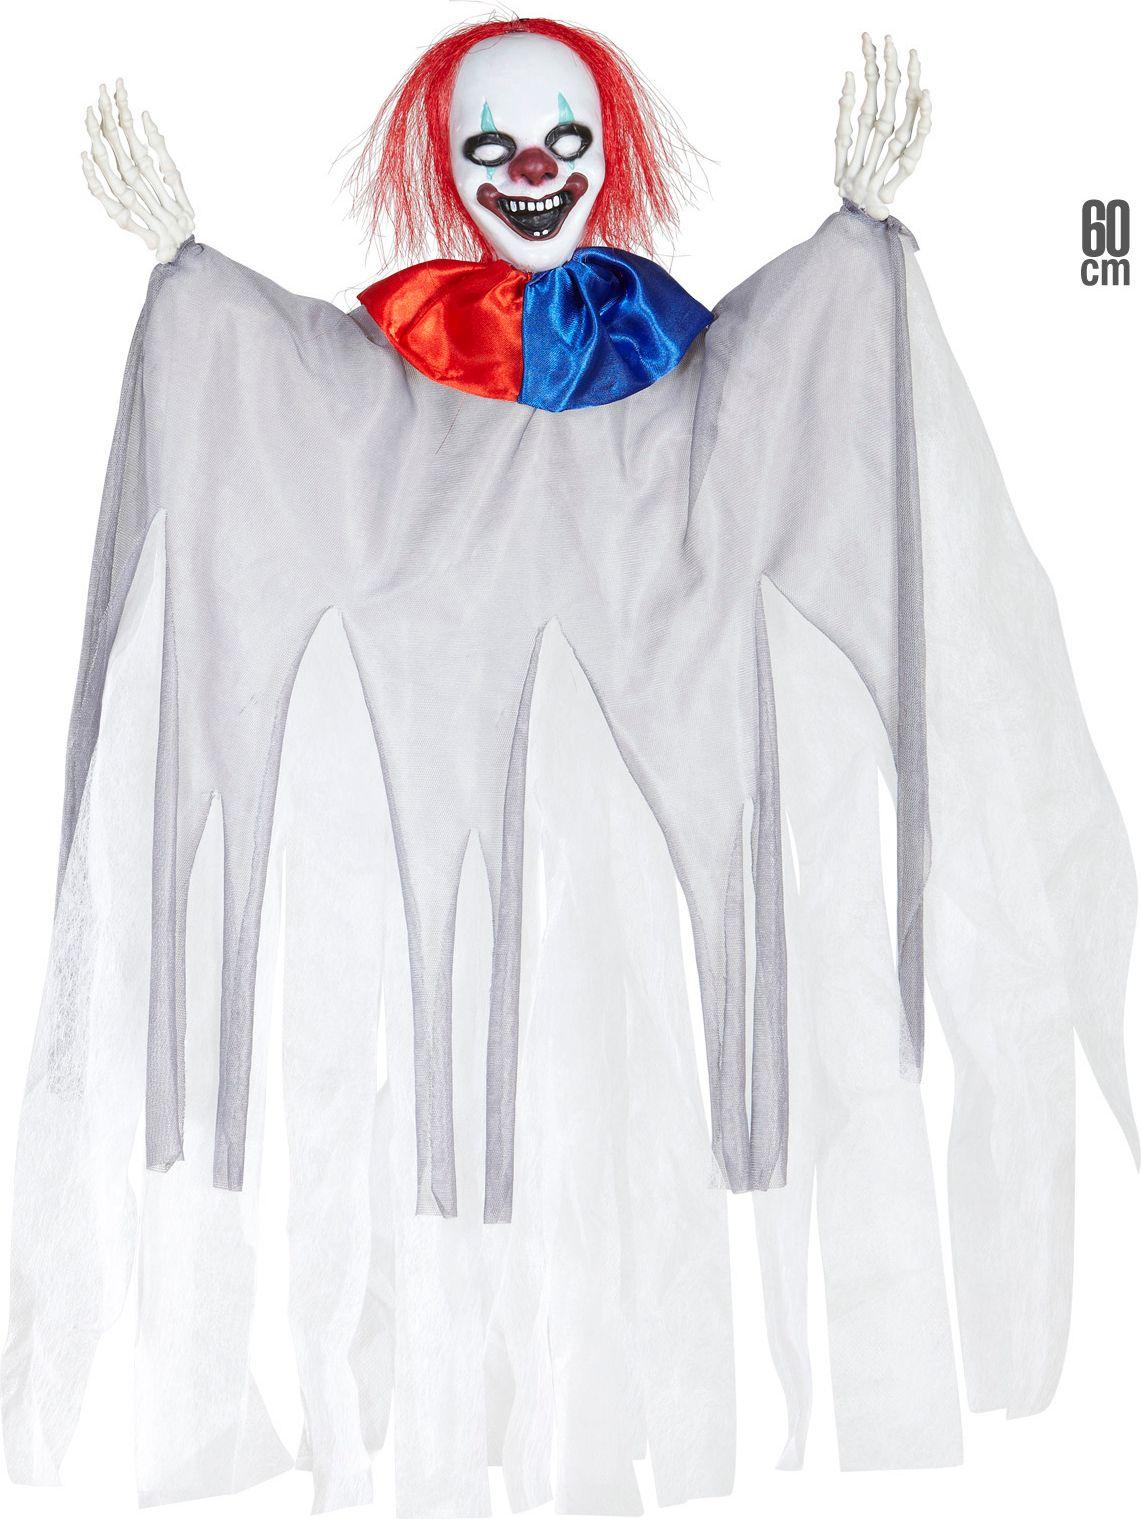 Killer clown decoratie